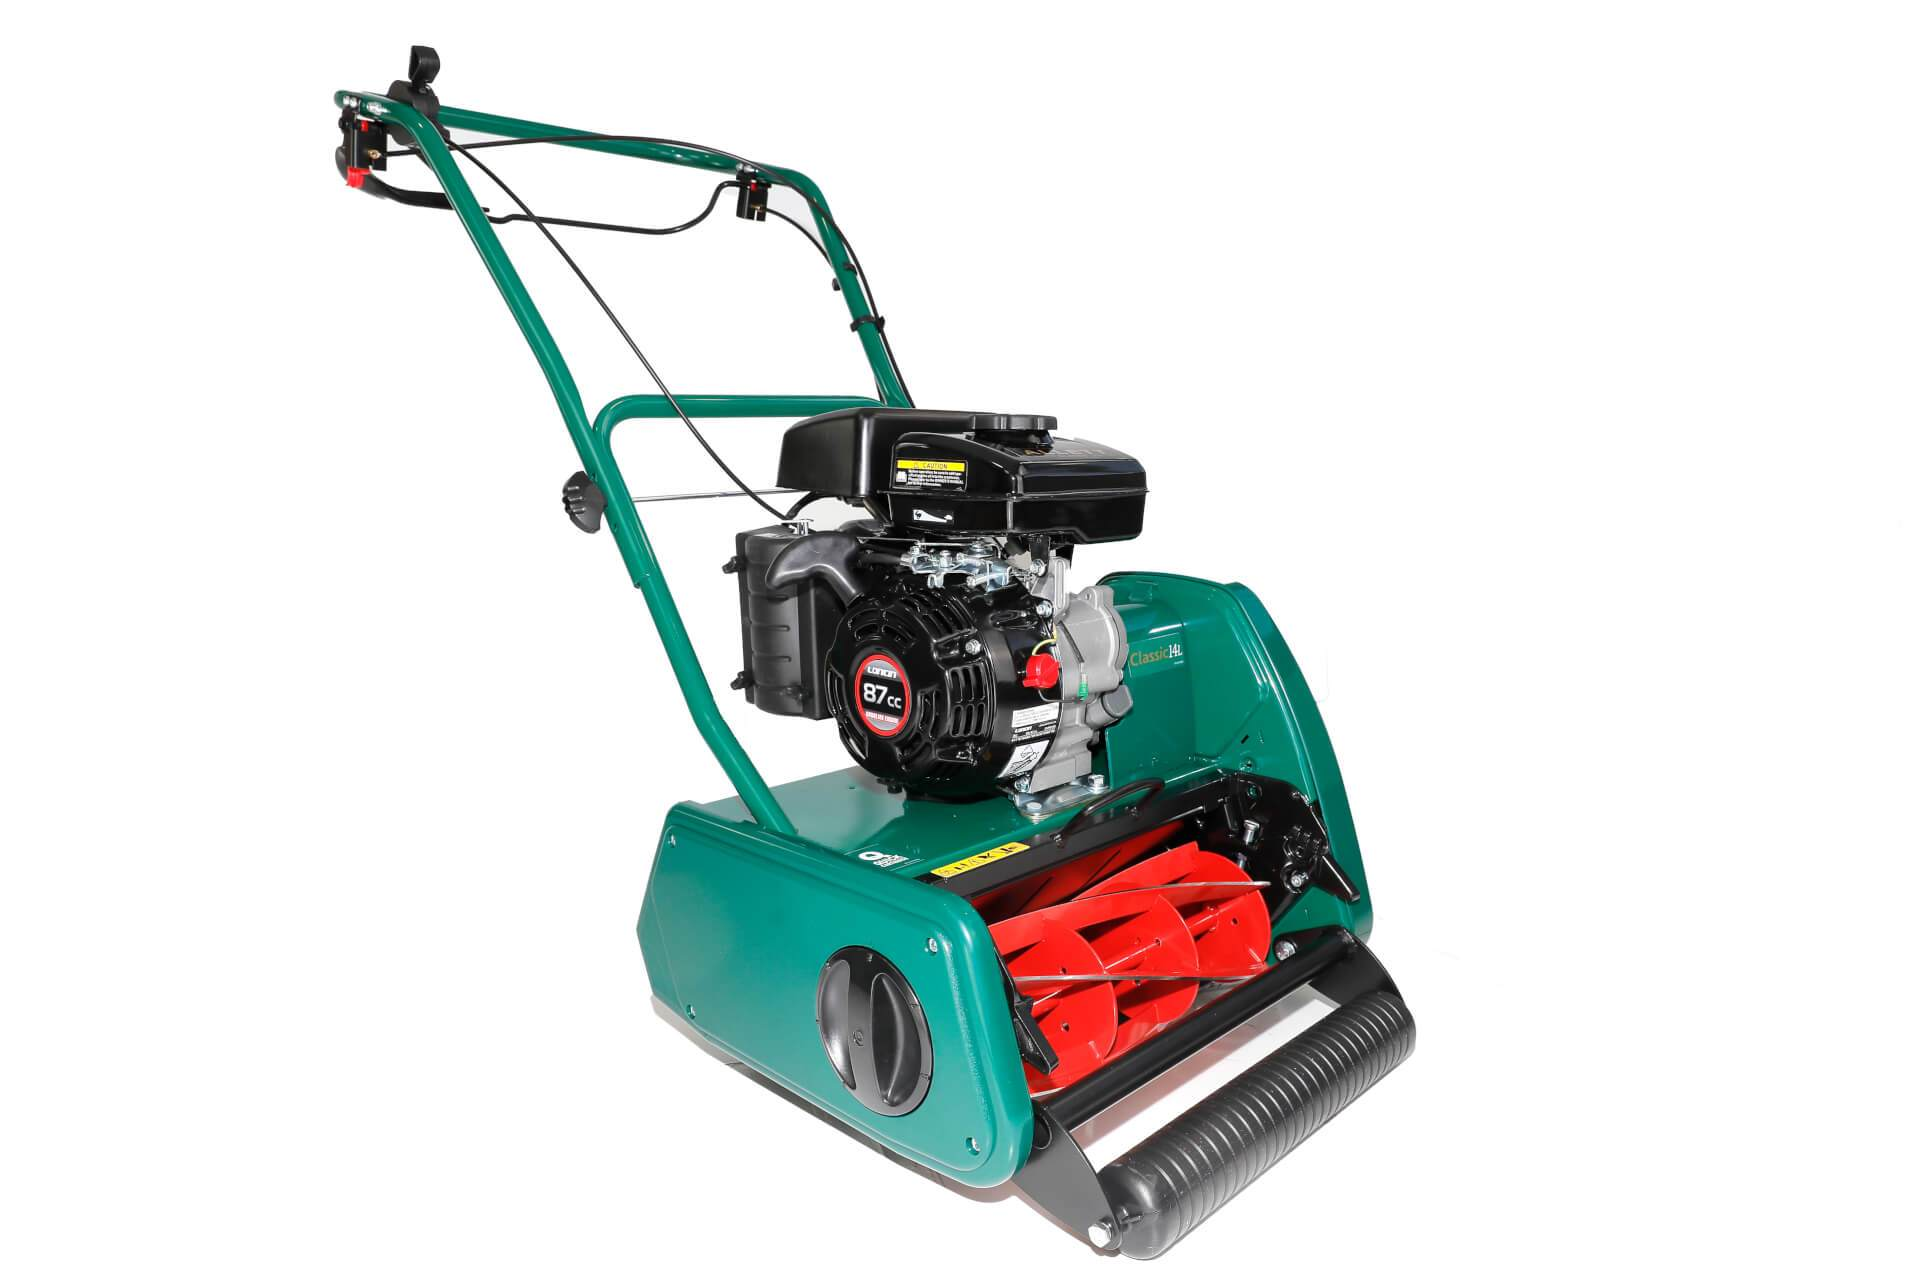 Allett Classic 14L Petrol Cylinder Mower | Plymouth Garden Machinery